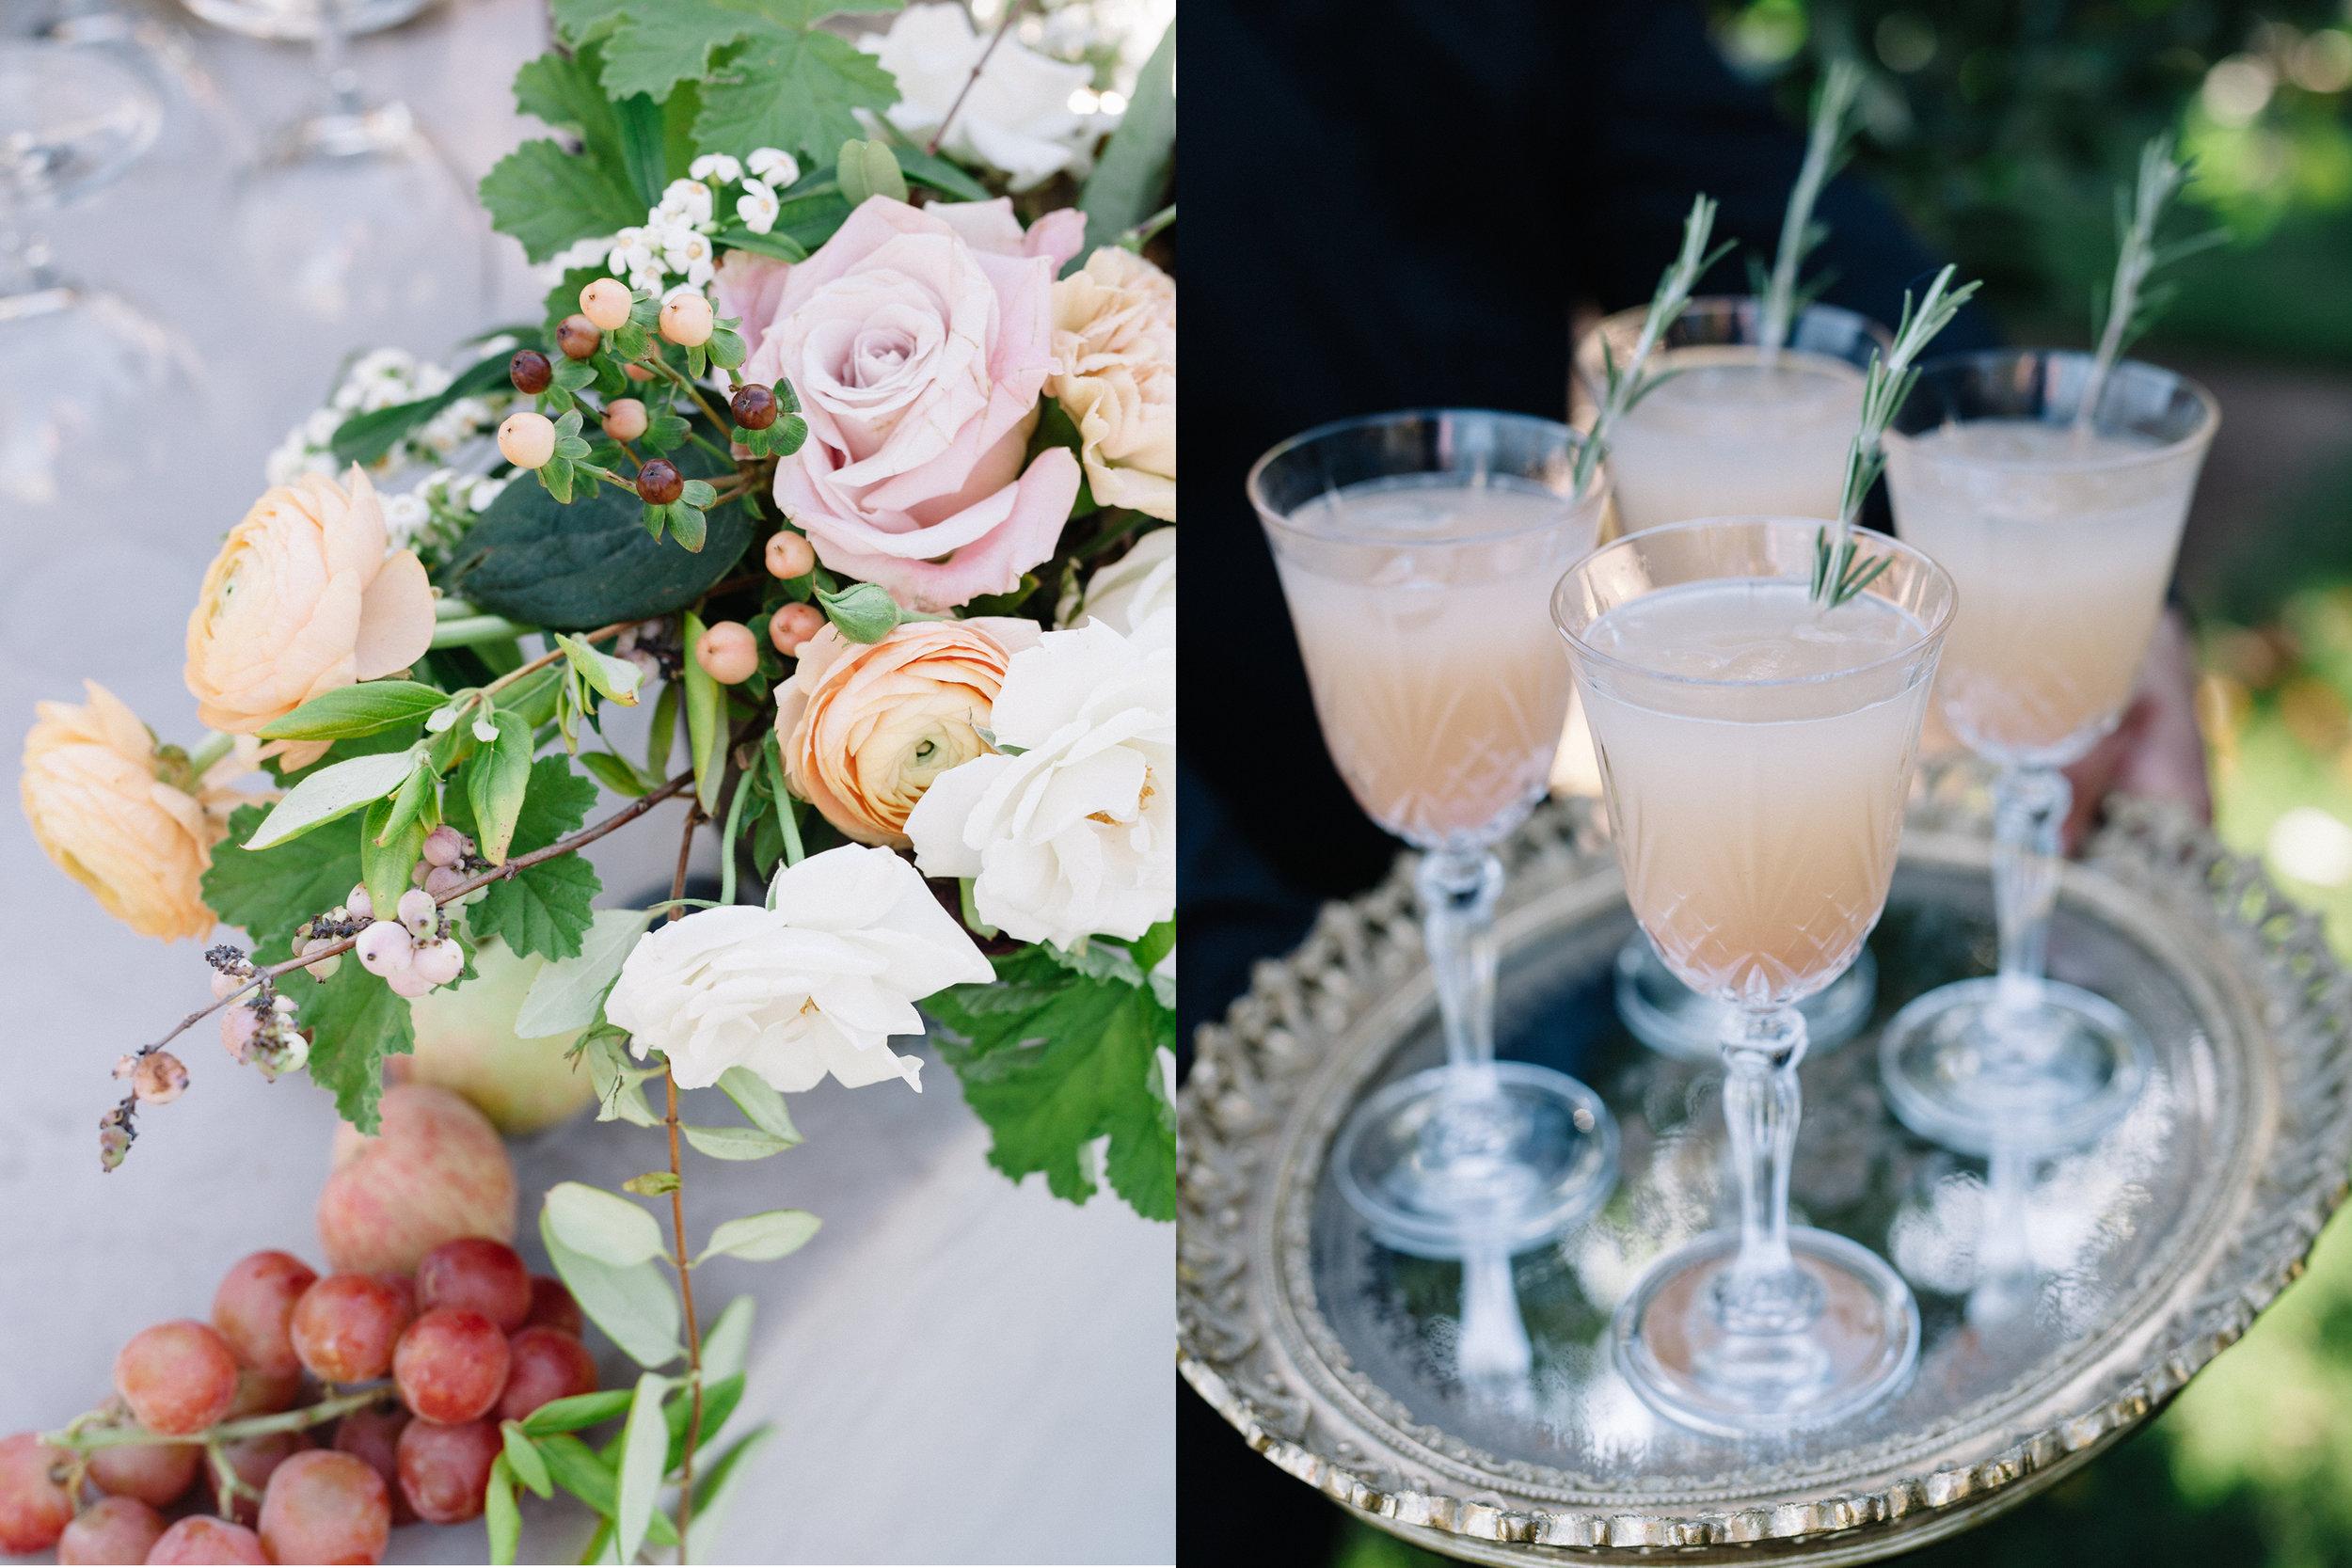 santa-barbara-elopement-elope-wedding-planner-planning-coordinator-day-of-intimate-event-design-kestrel-park-santa-ynez-english-country-estate-garden-castle (15).jpg